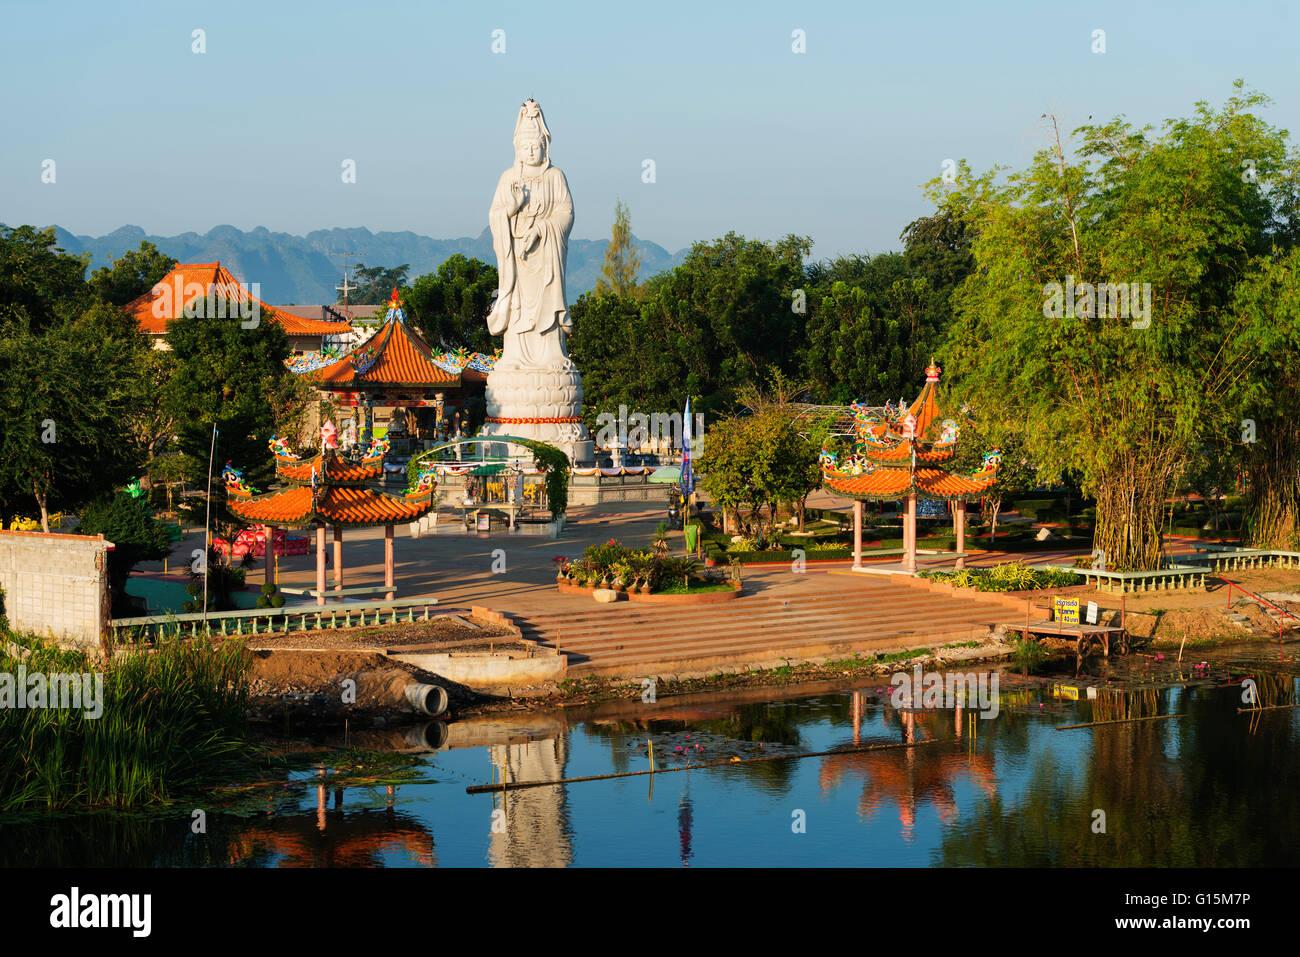 Río Kwai y Kuang Im Capilla templo budista, Kanchanaburi, Tailandia, el sudeste de Asia, Asia Imagen De Stock